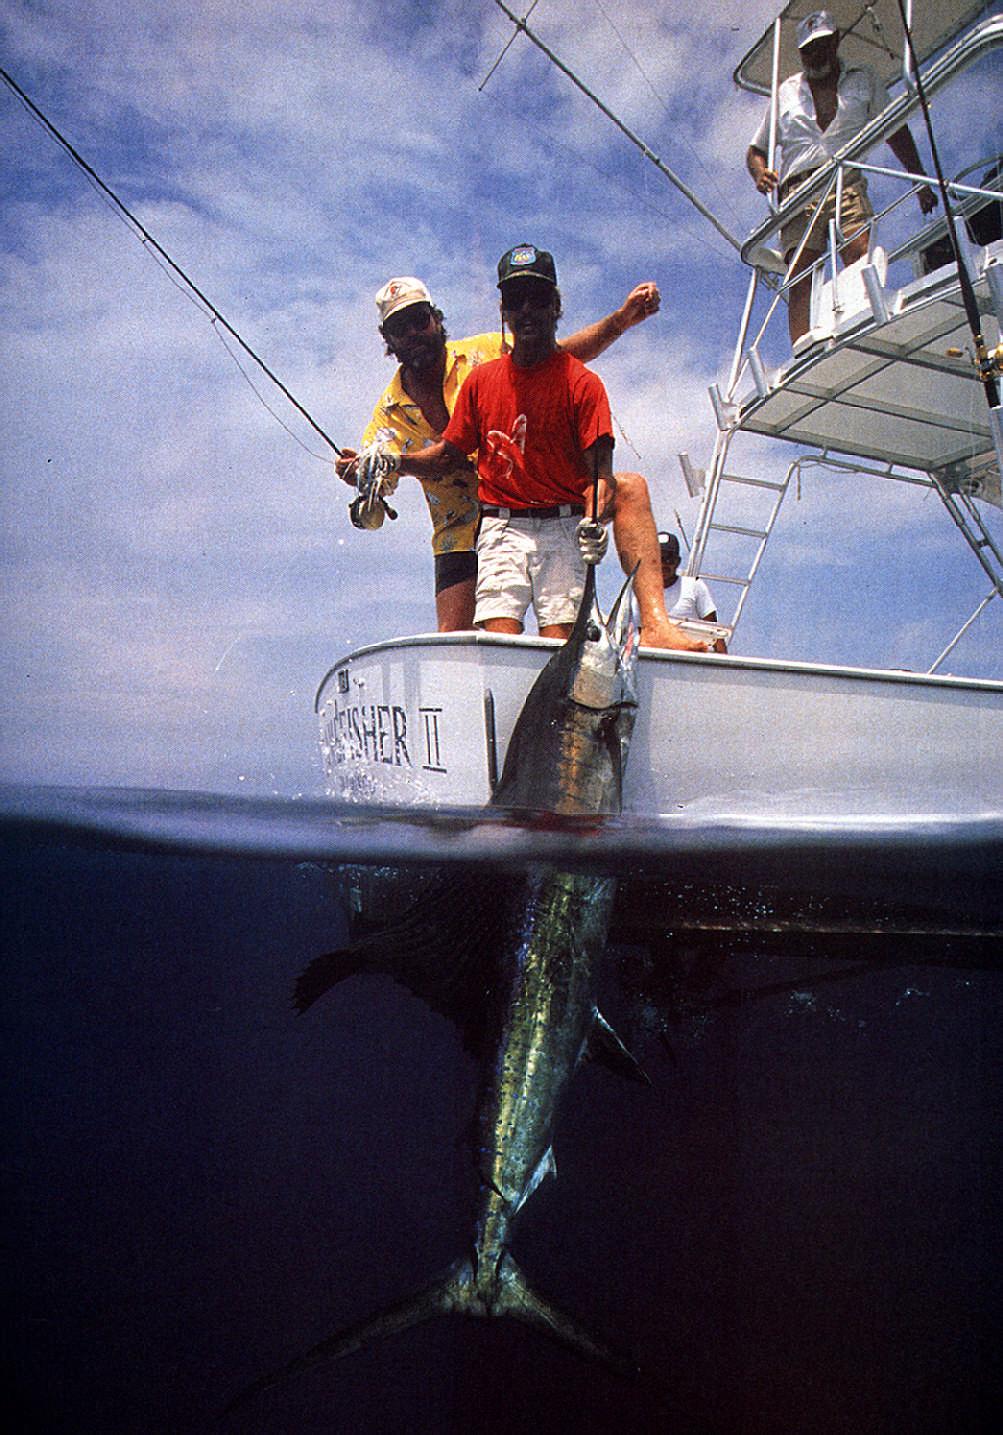 Spoils of the hunt: Caribbean sailfish. Photograph by Darrell Jones